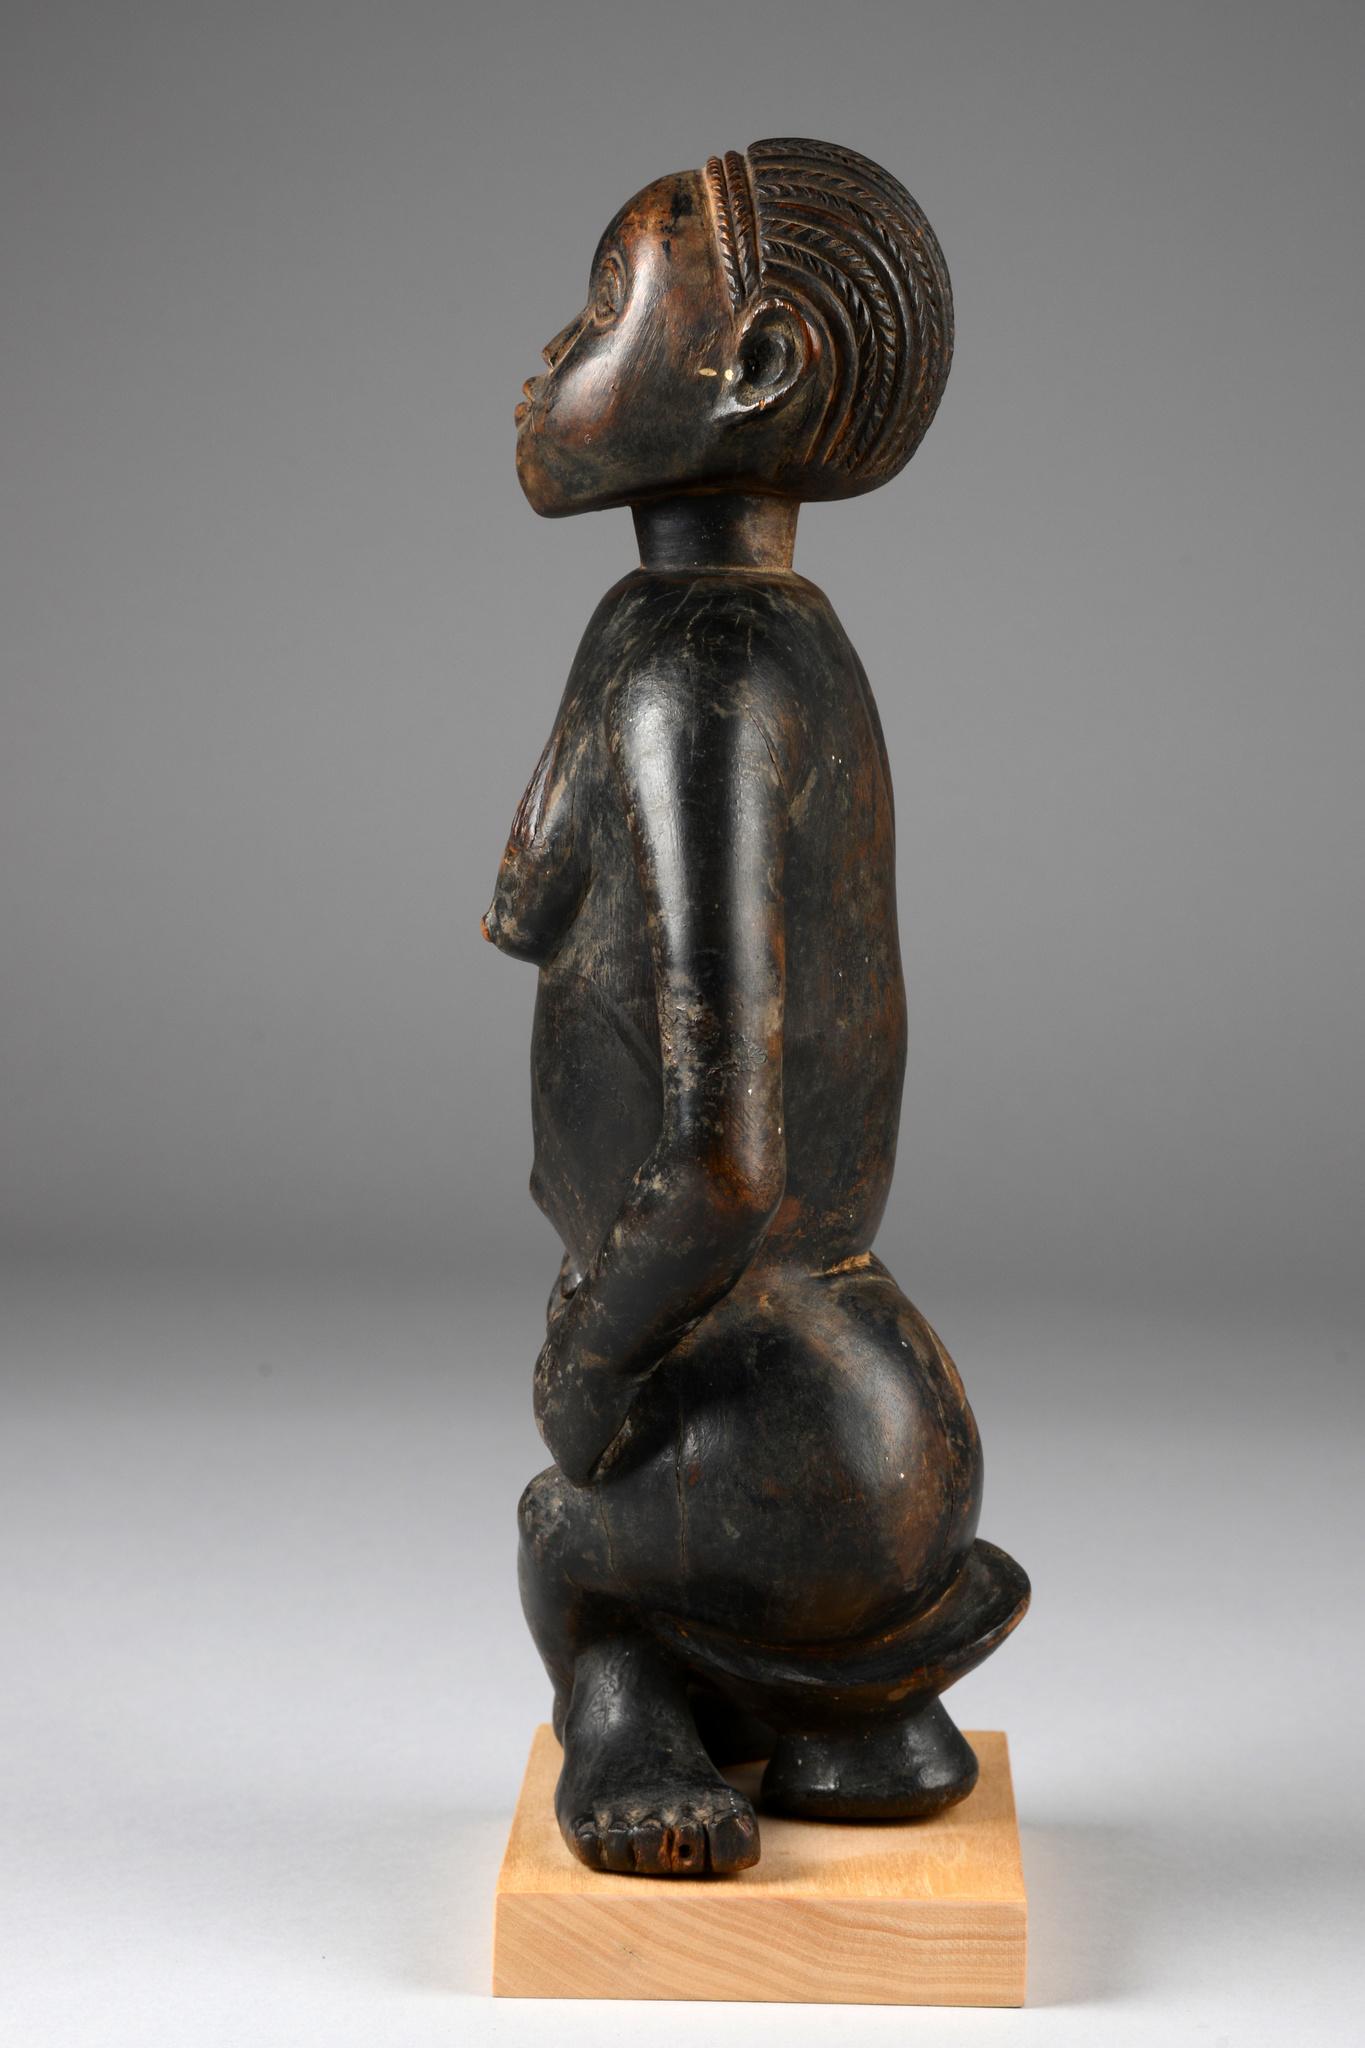 Seated female figure